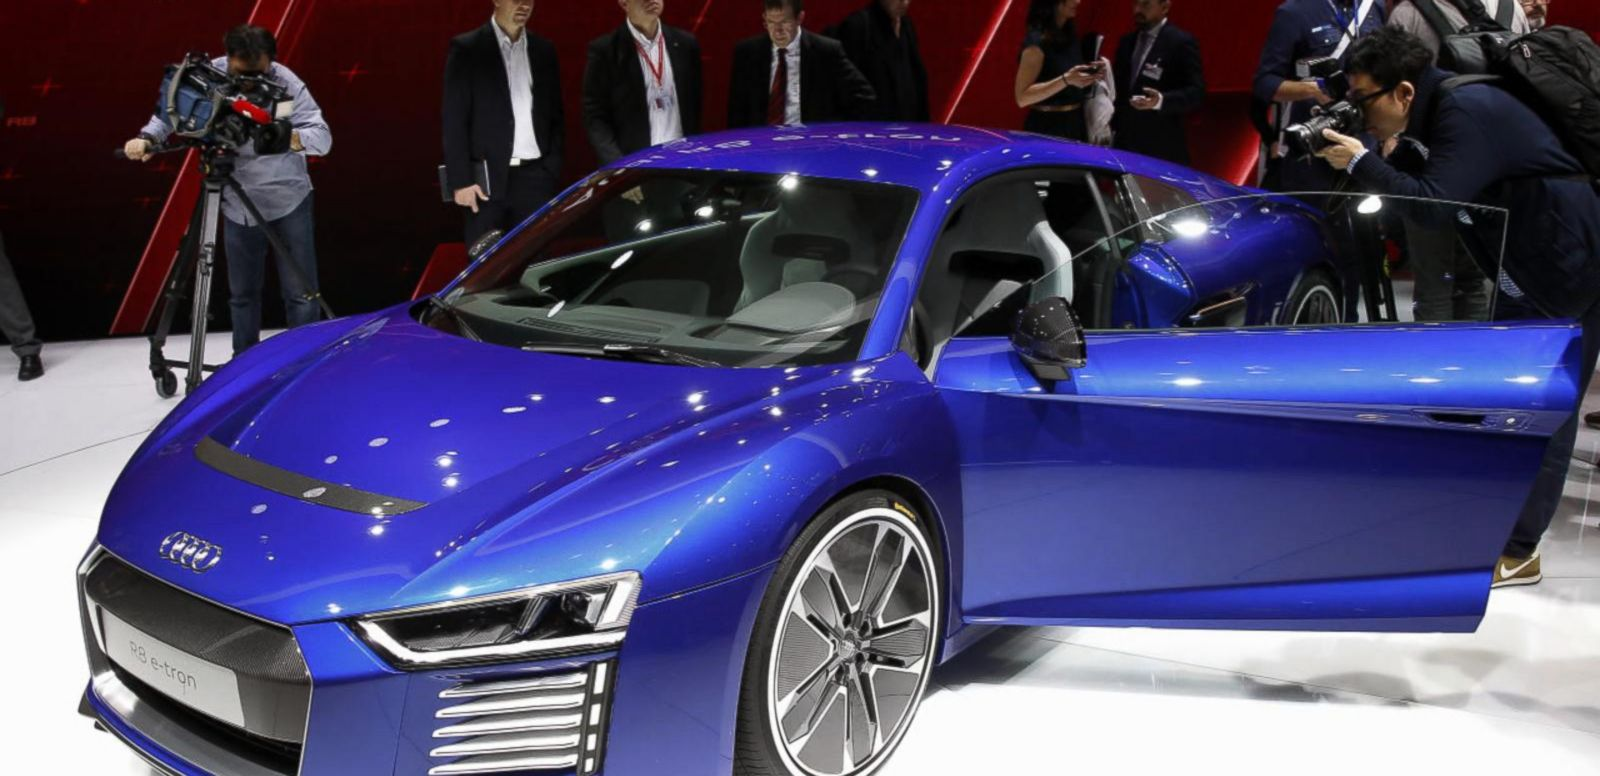 VIDEO: Auto Buyers Spending More to Upsize